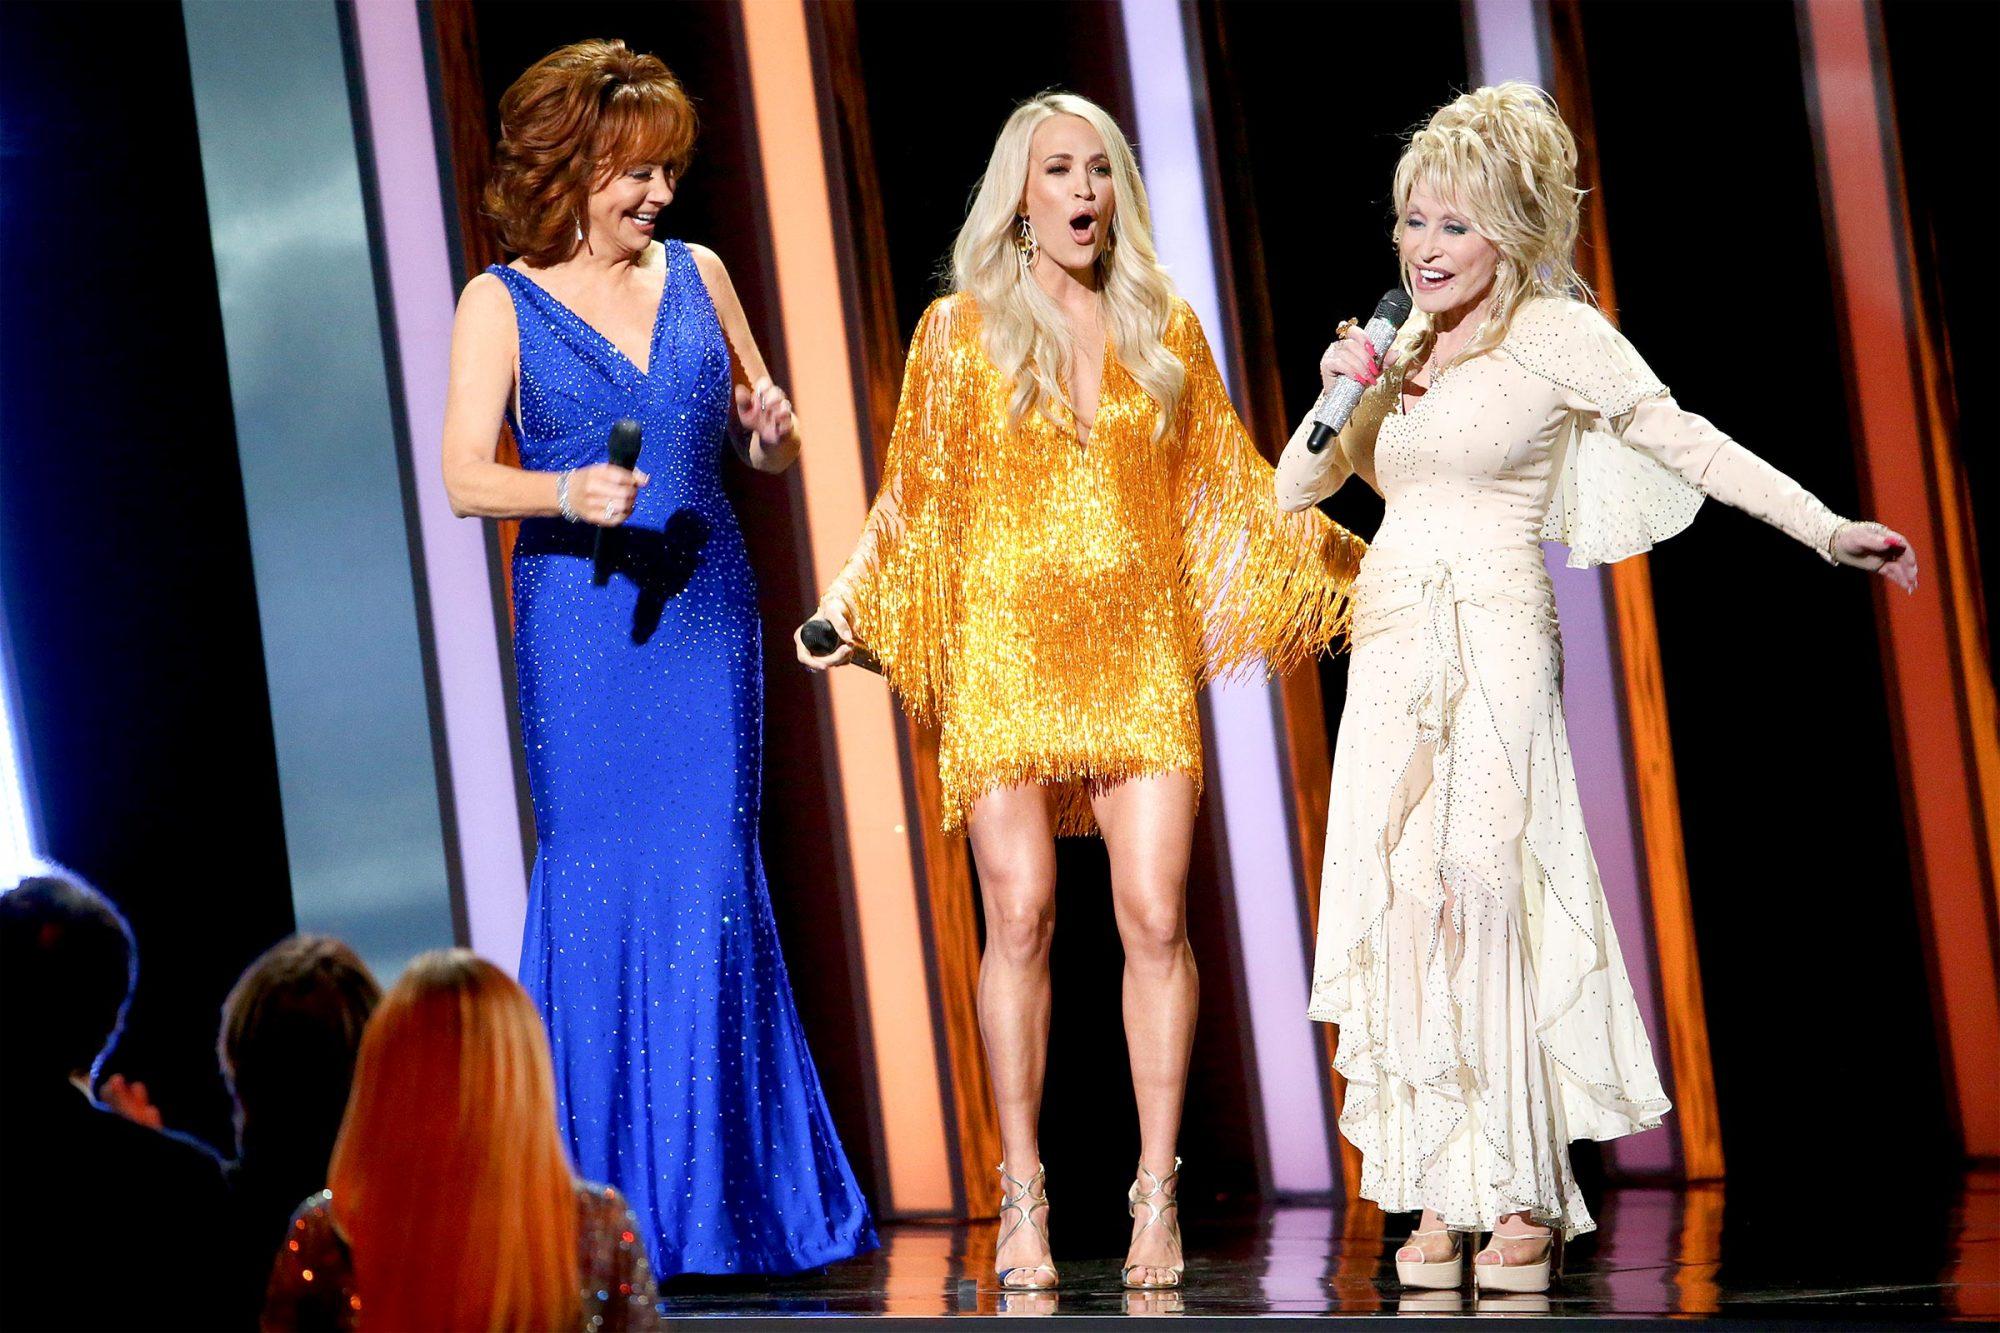 CMA Awards - Reba McEntire, Carrie Underwood, Dolly Parton